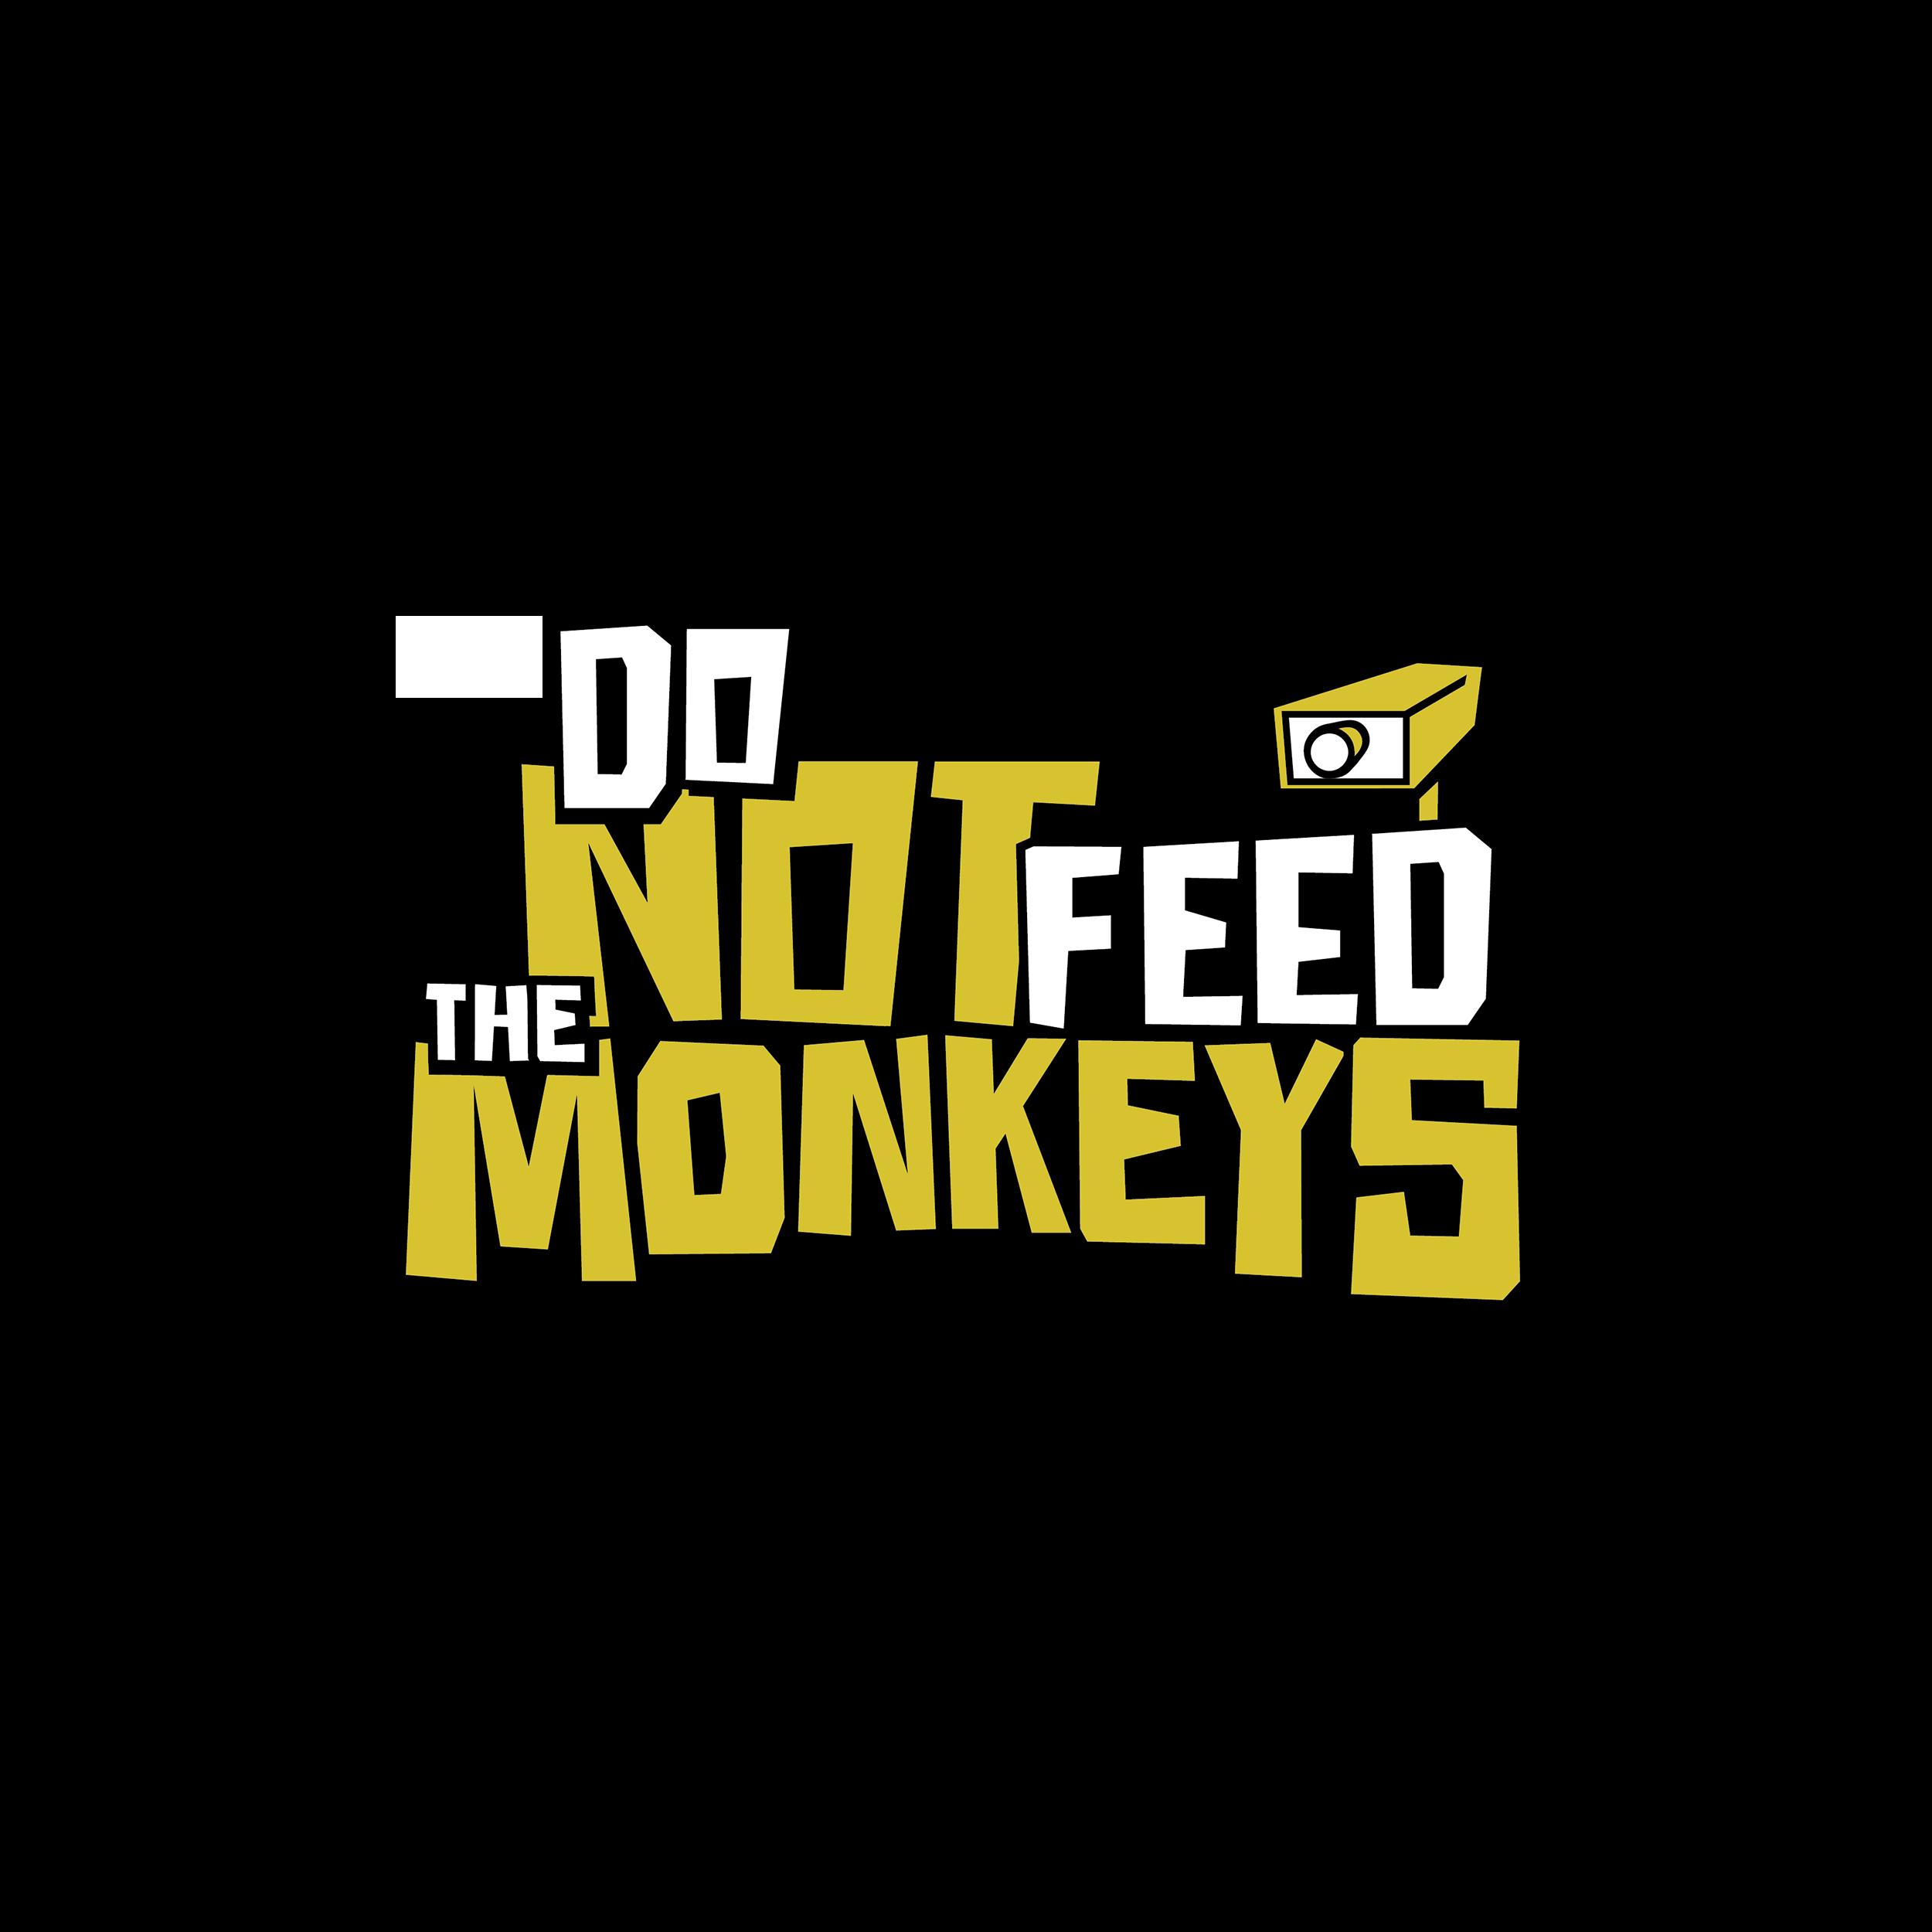 Do Not Feed The Monkeys logo